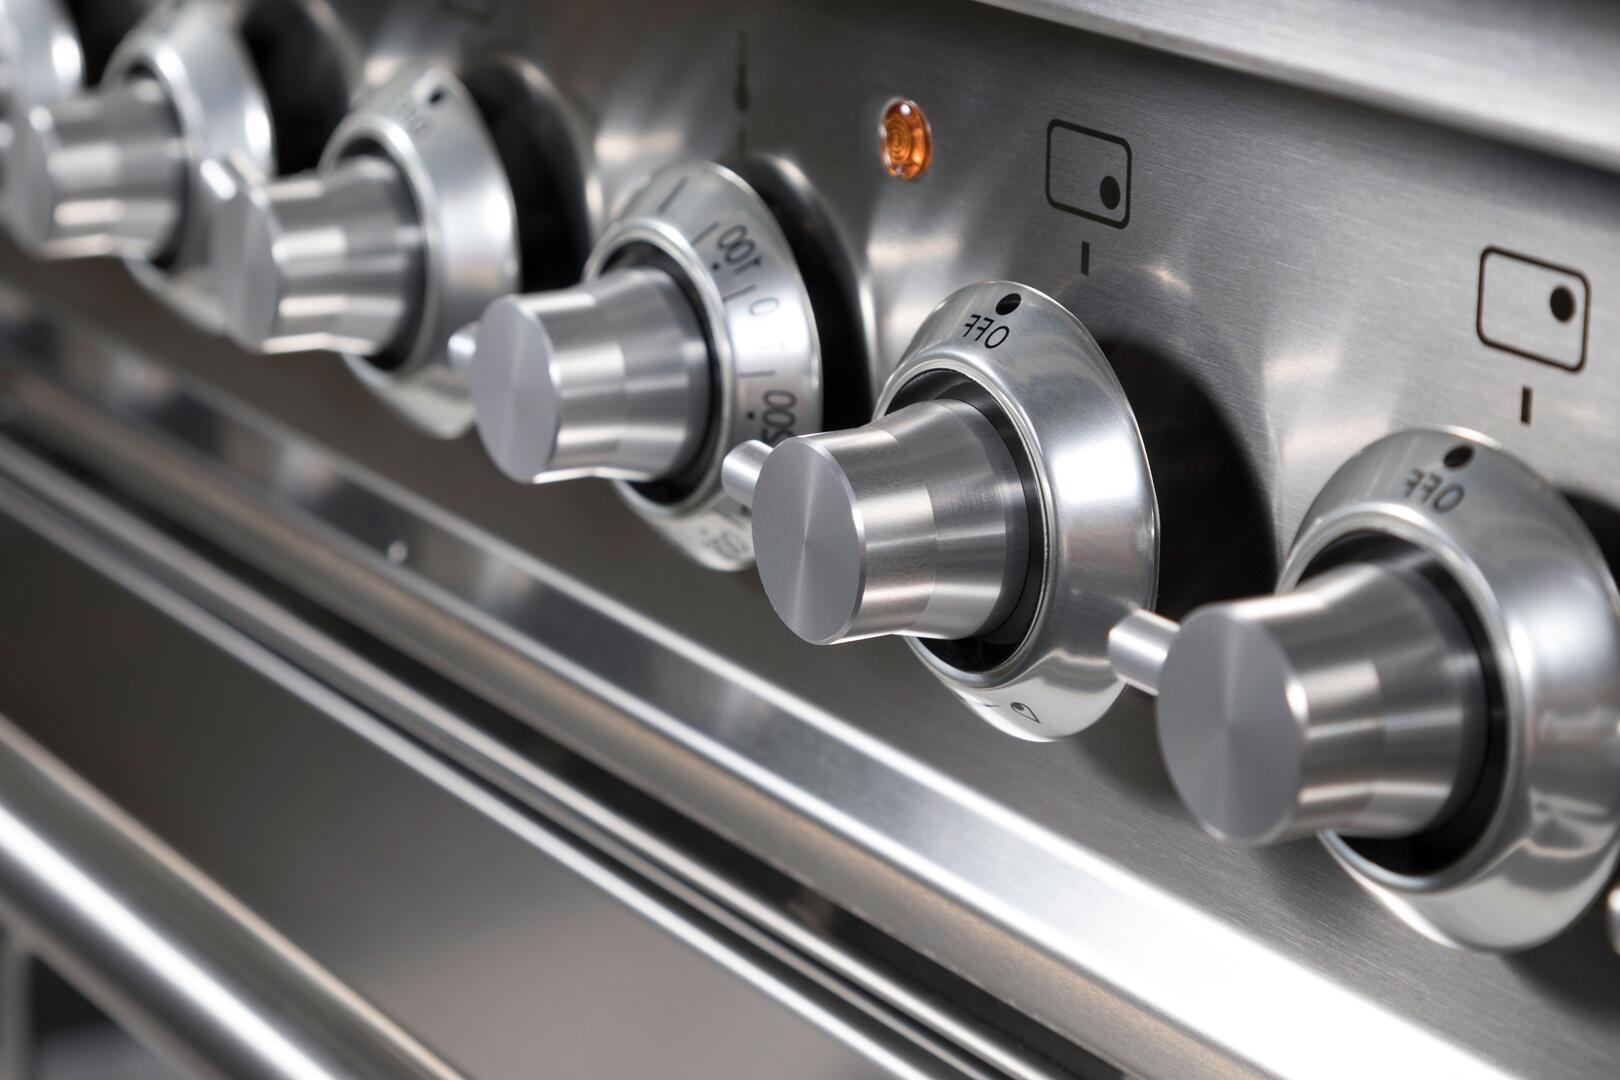 Ilve Professional Plus UPDW90FDMPILP Freestanding Dual Fuel Range Stainless Steel, ILVE UPDW90FDMPING Range Lifestyle